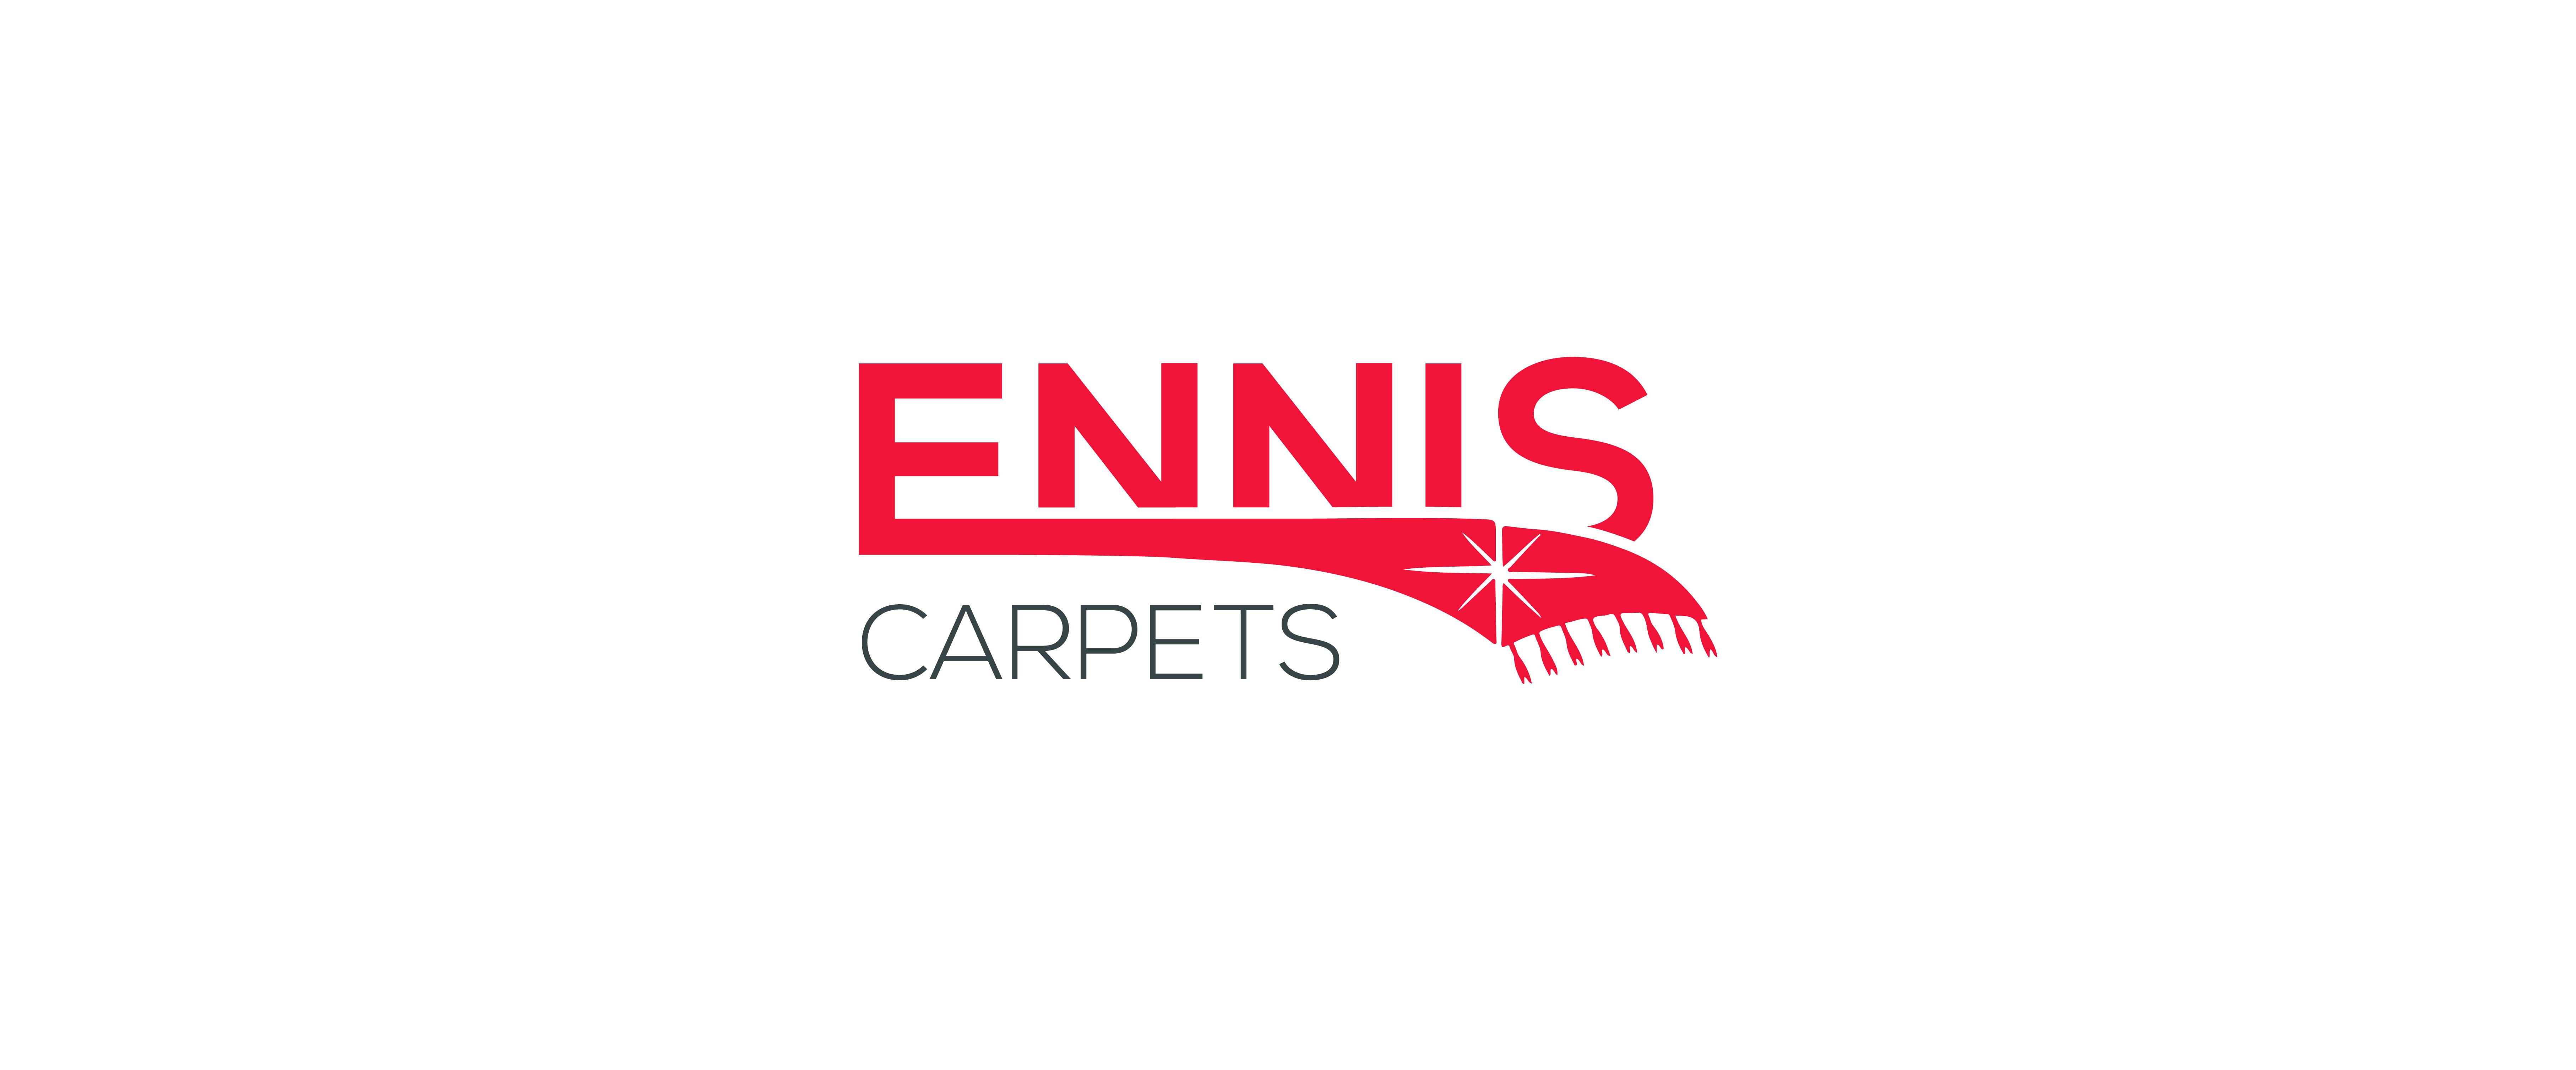 Ennis Carpets 1